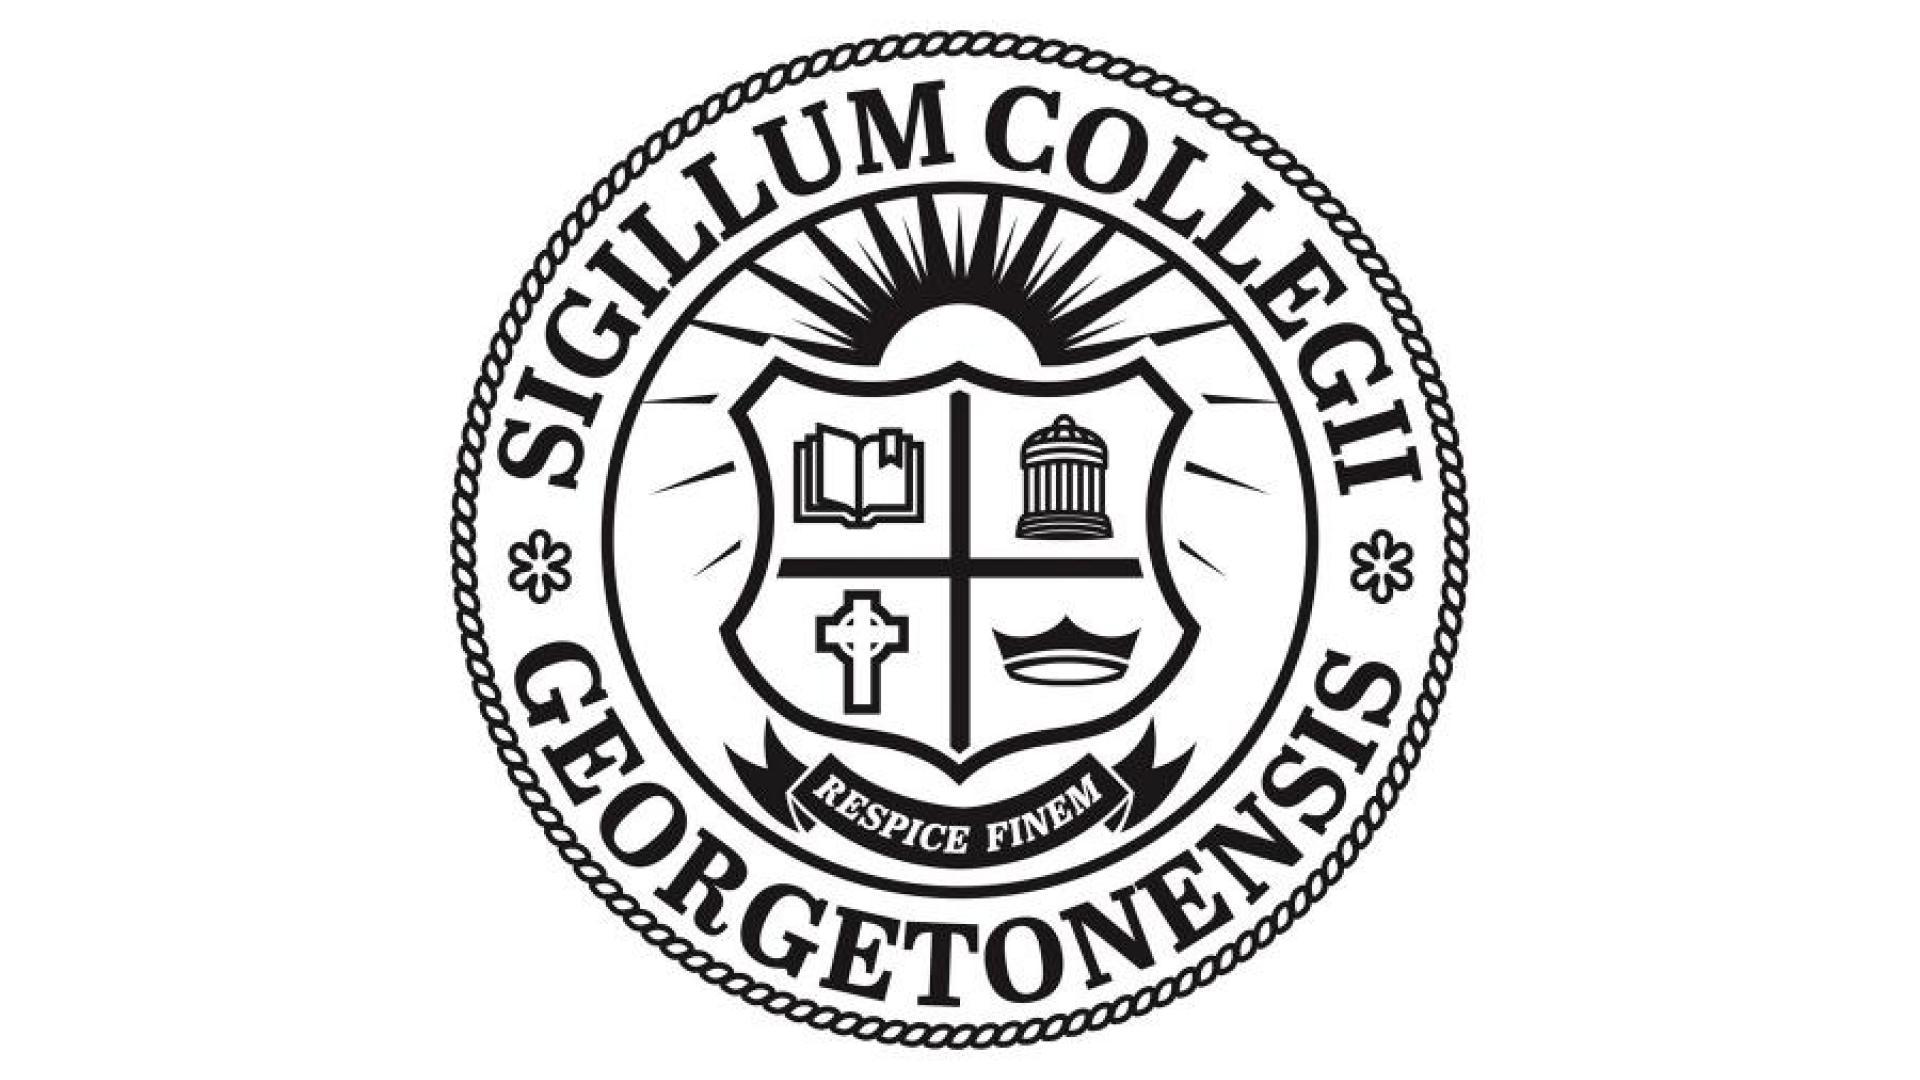 Georgetown College Seal